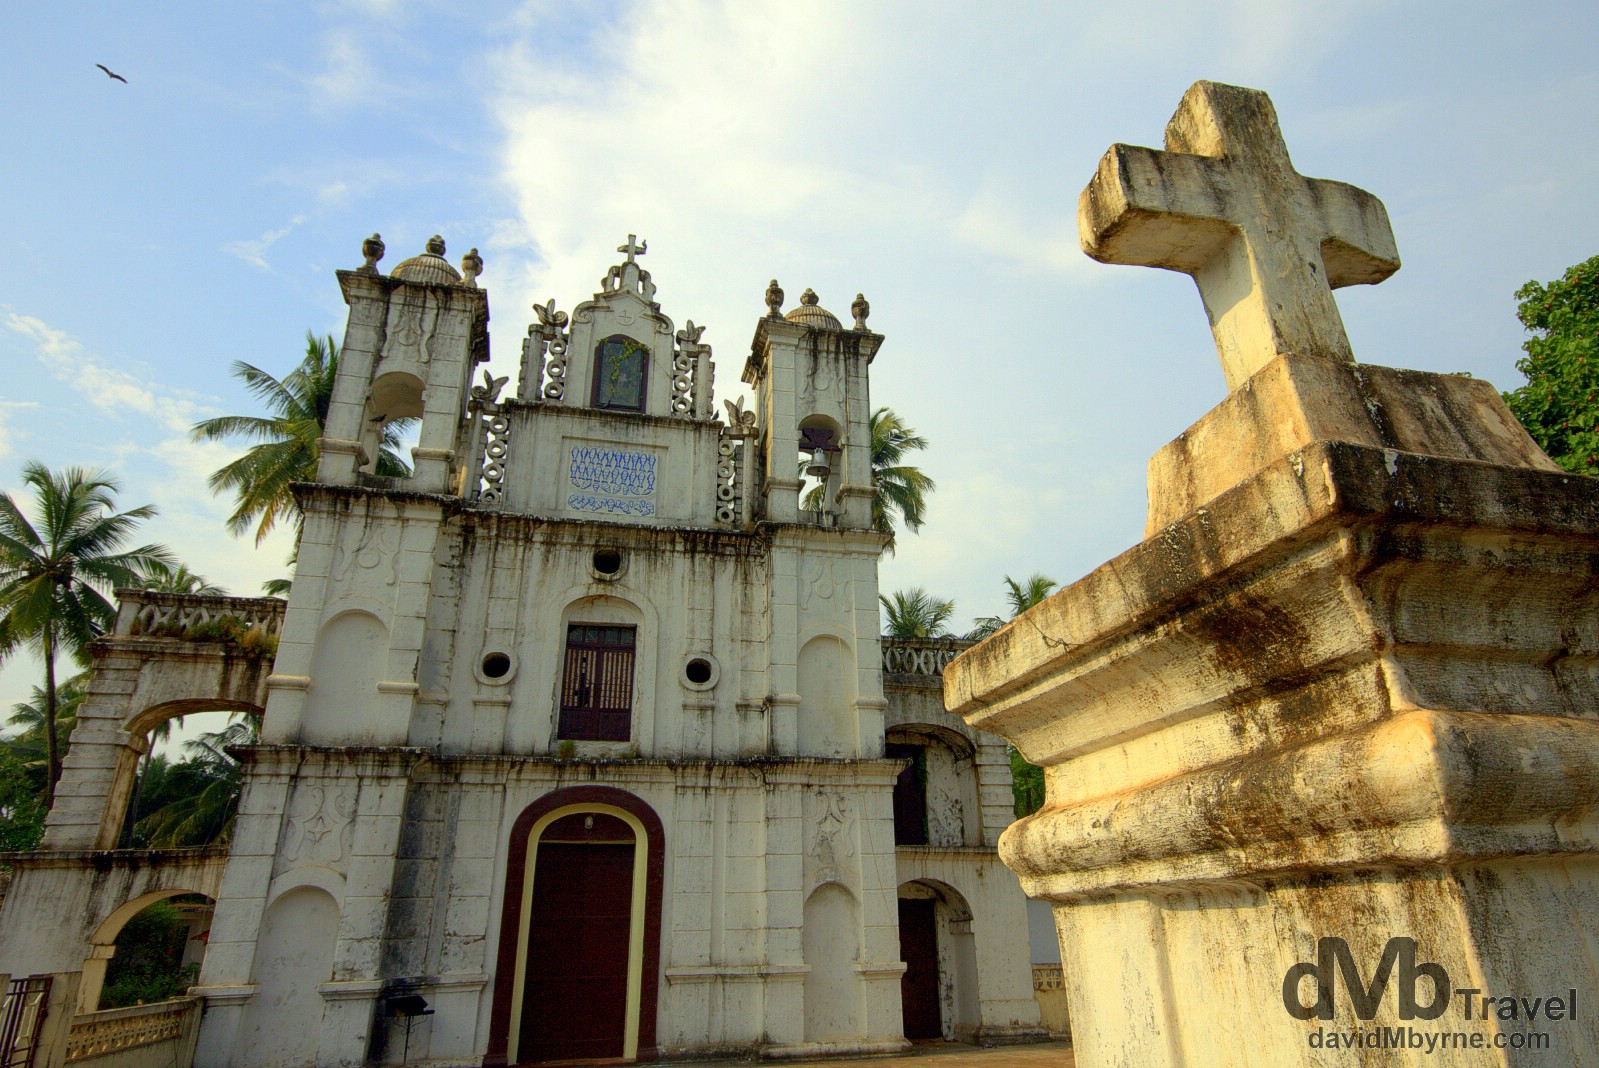 St Anthony's Chapel, Anjuna, Goa, India. September 29th 2012.